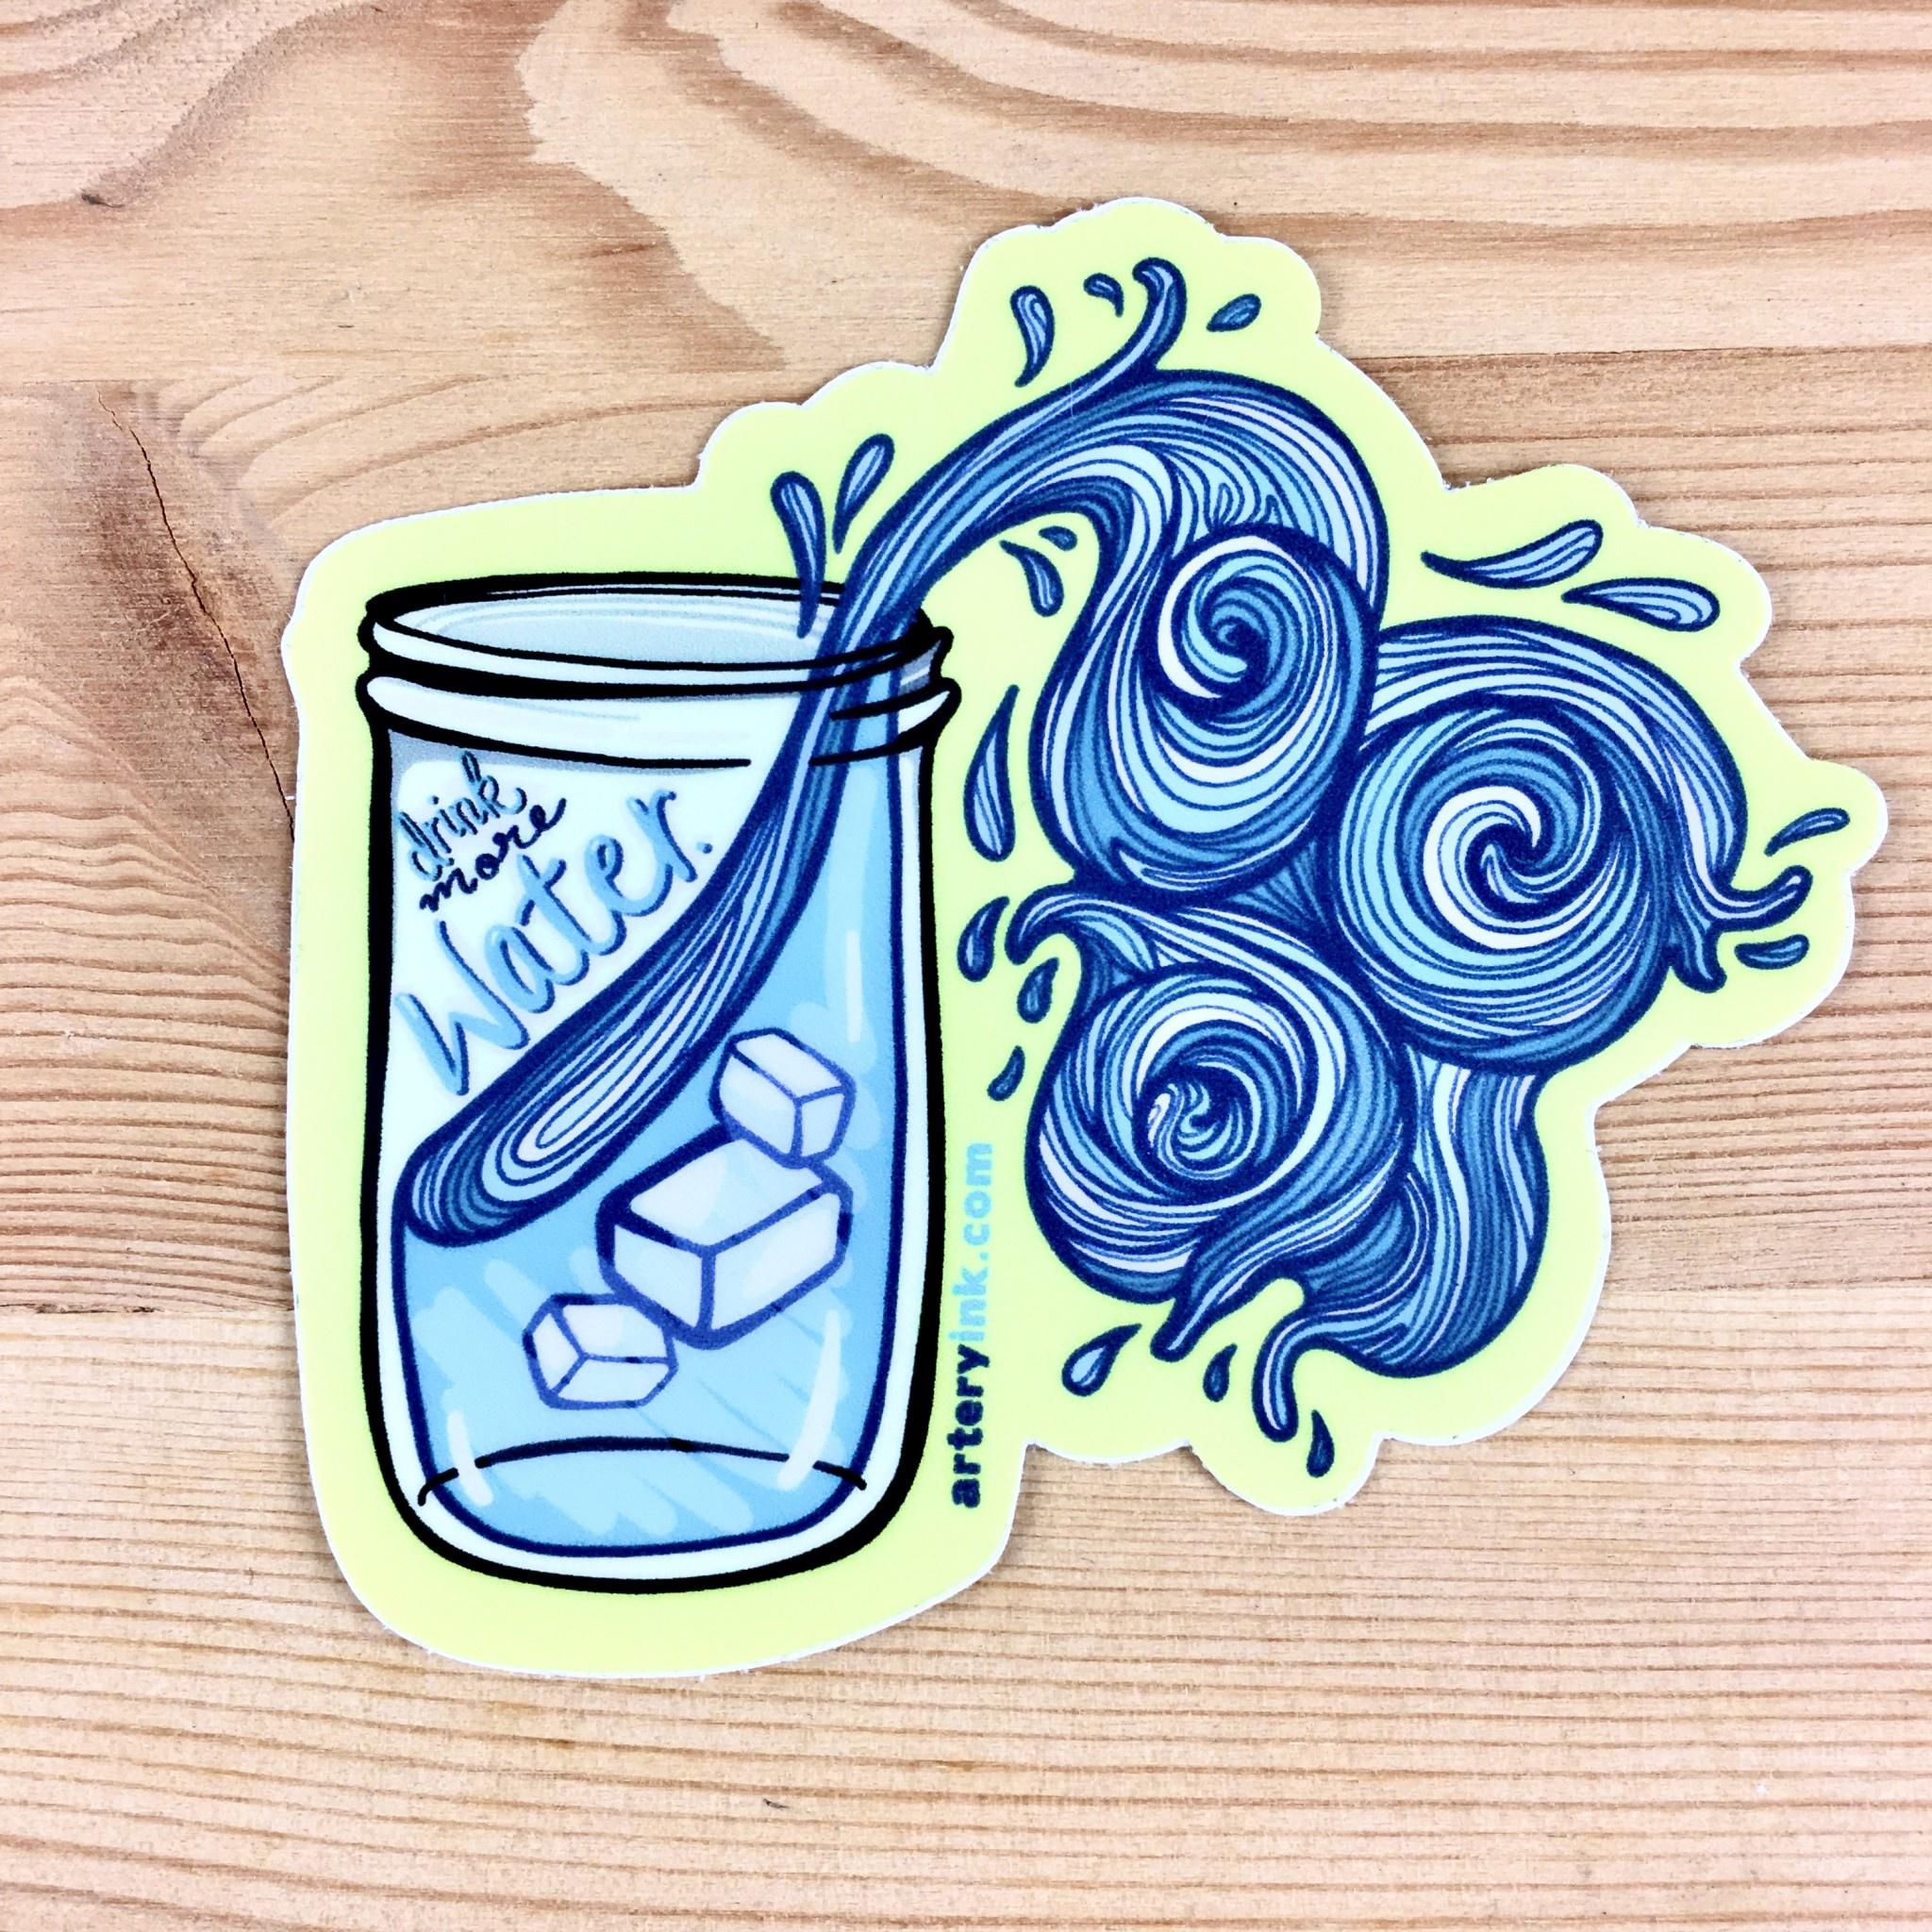 Artery Ink Drink More Water Reminder Sticker